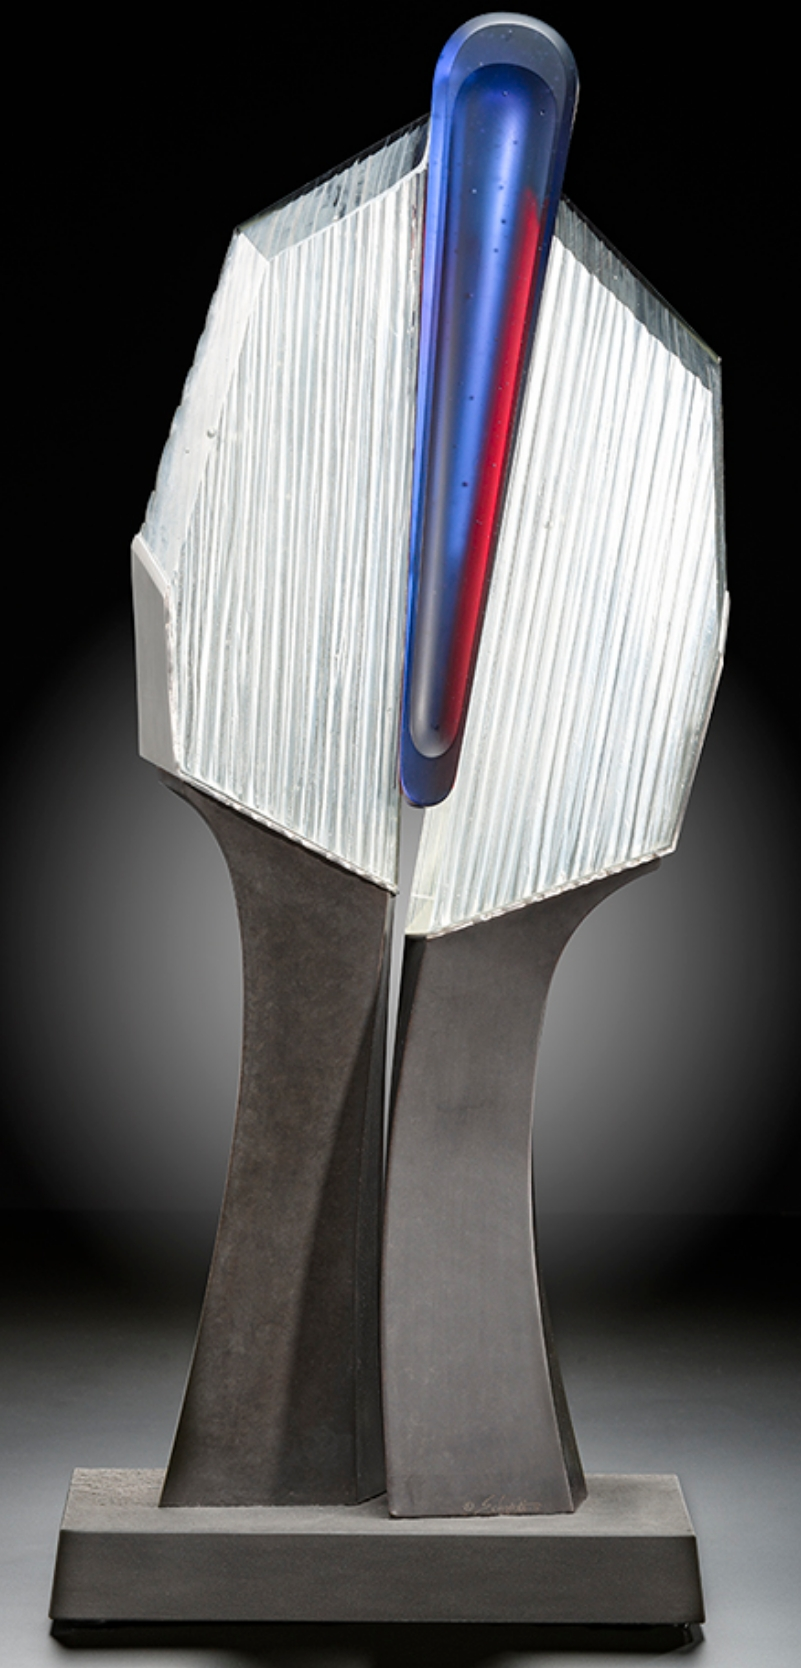 Mixed-media sculpture by artist Jack Schmidt